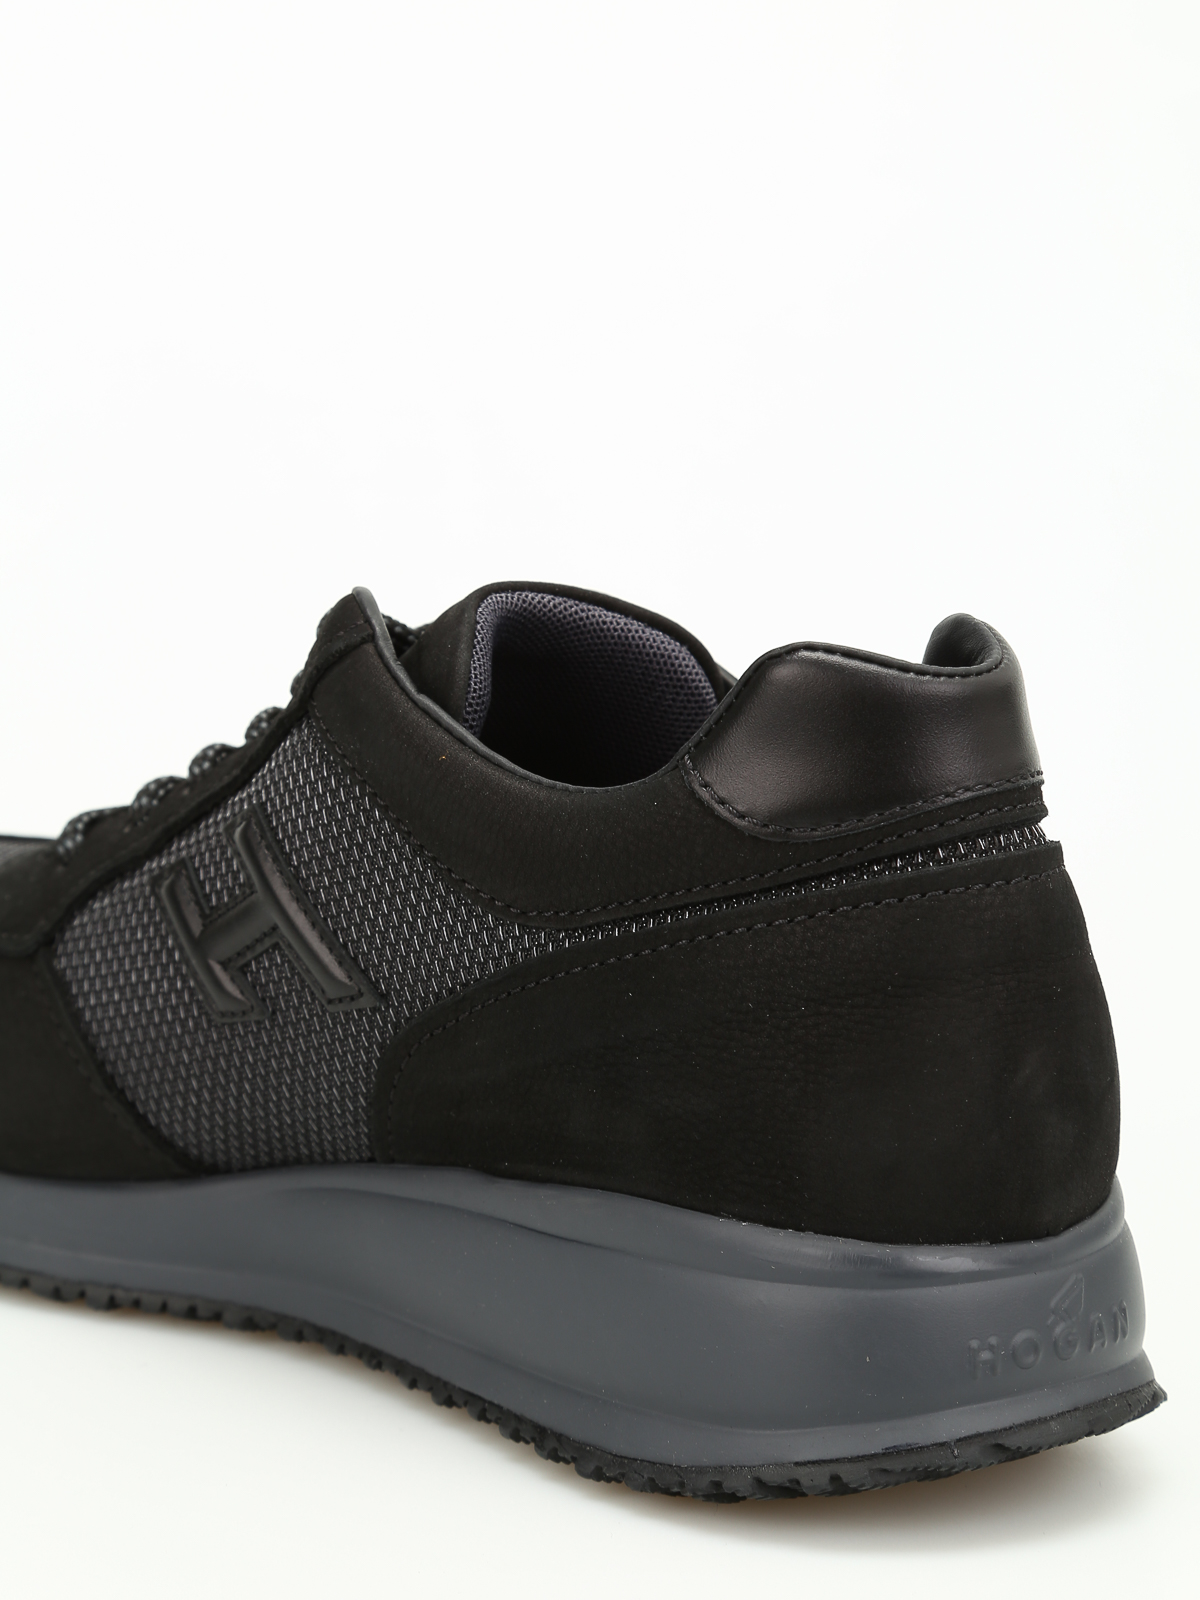 Sneakers Hogan - Interactive N20 in nabuk - HXM2460Z120H544361 ...